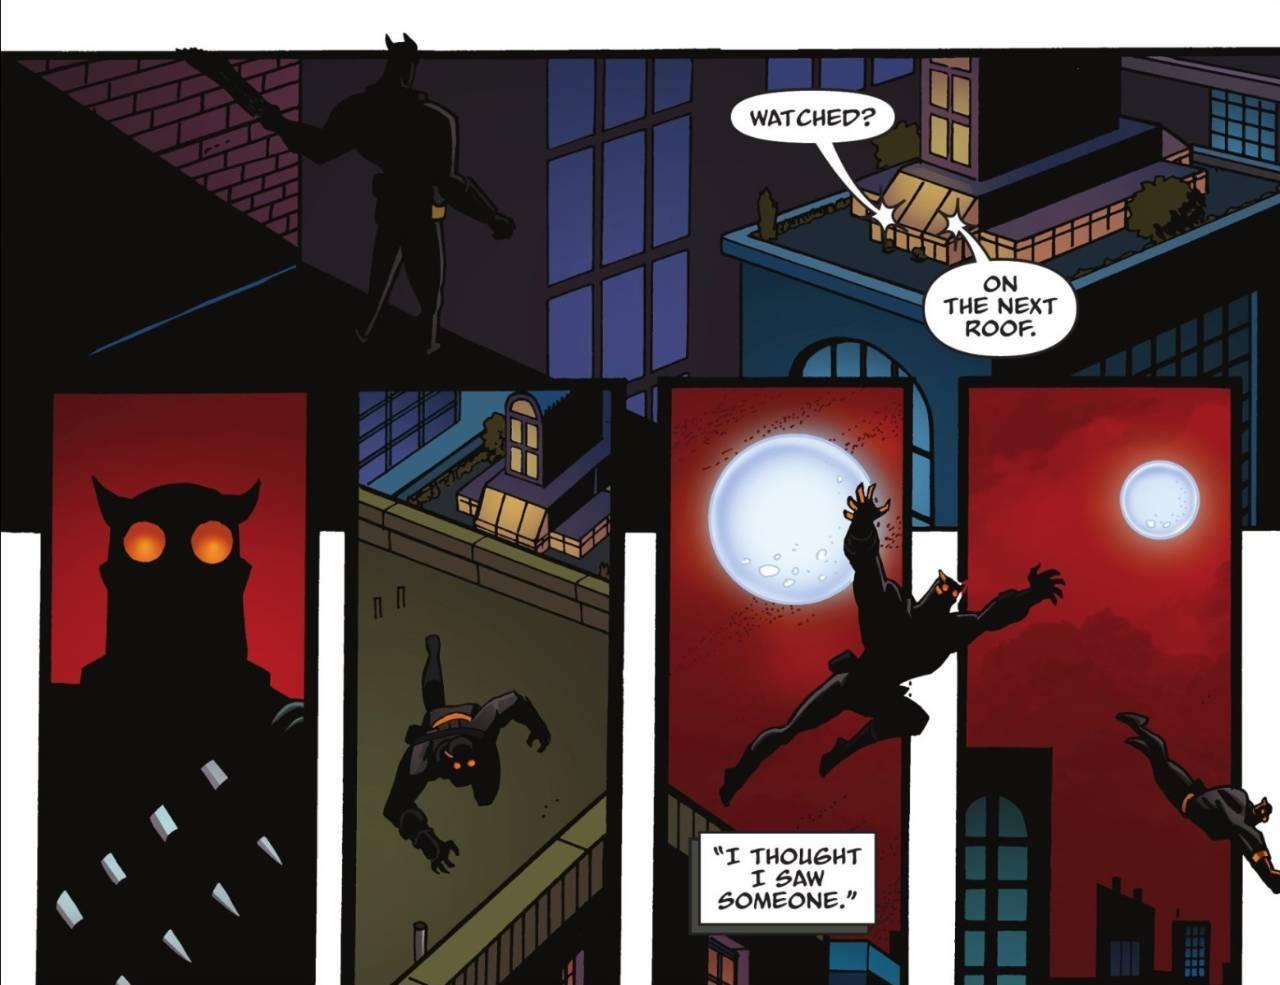 Court of Owls Talon Batman Adventure Continues Season 2